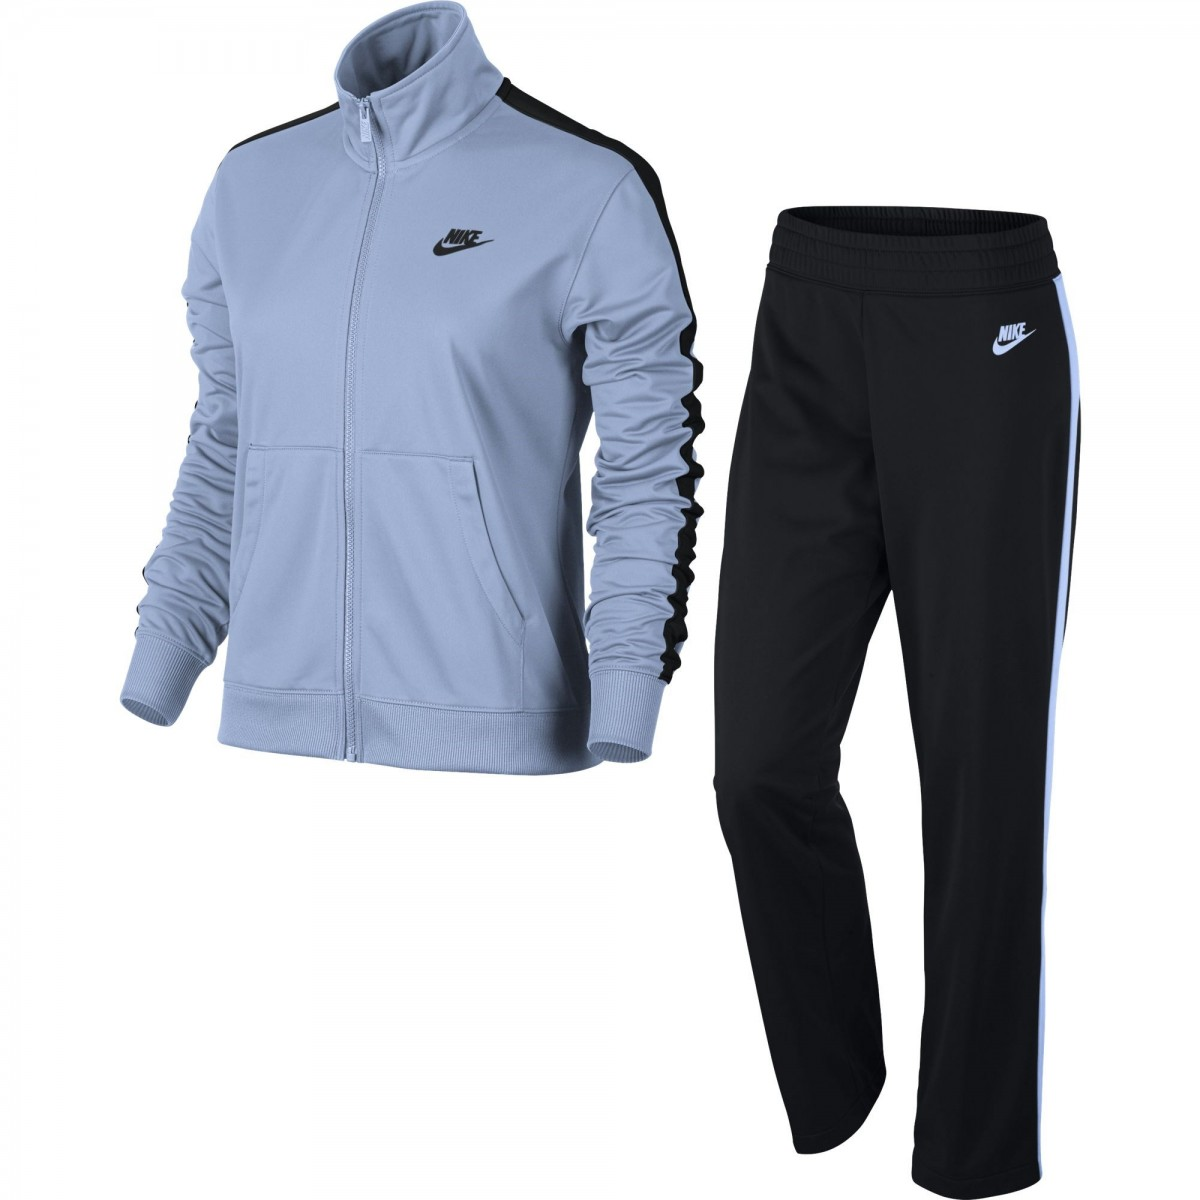 Bizz Store - Agasalho Feminino Nike Suit Esportivo 66fe969ad6052